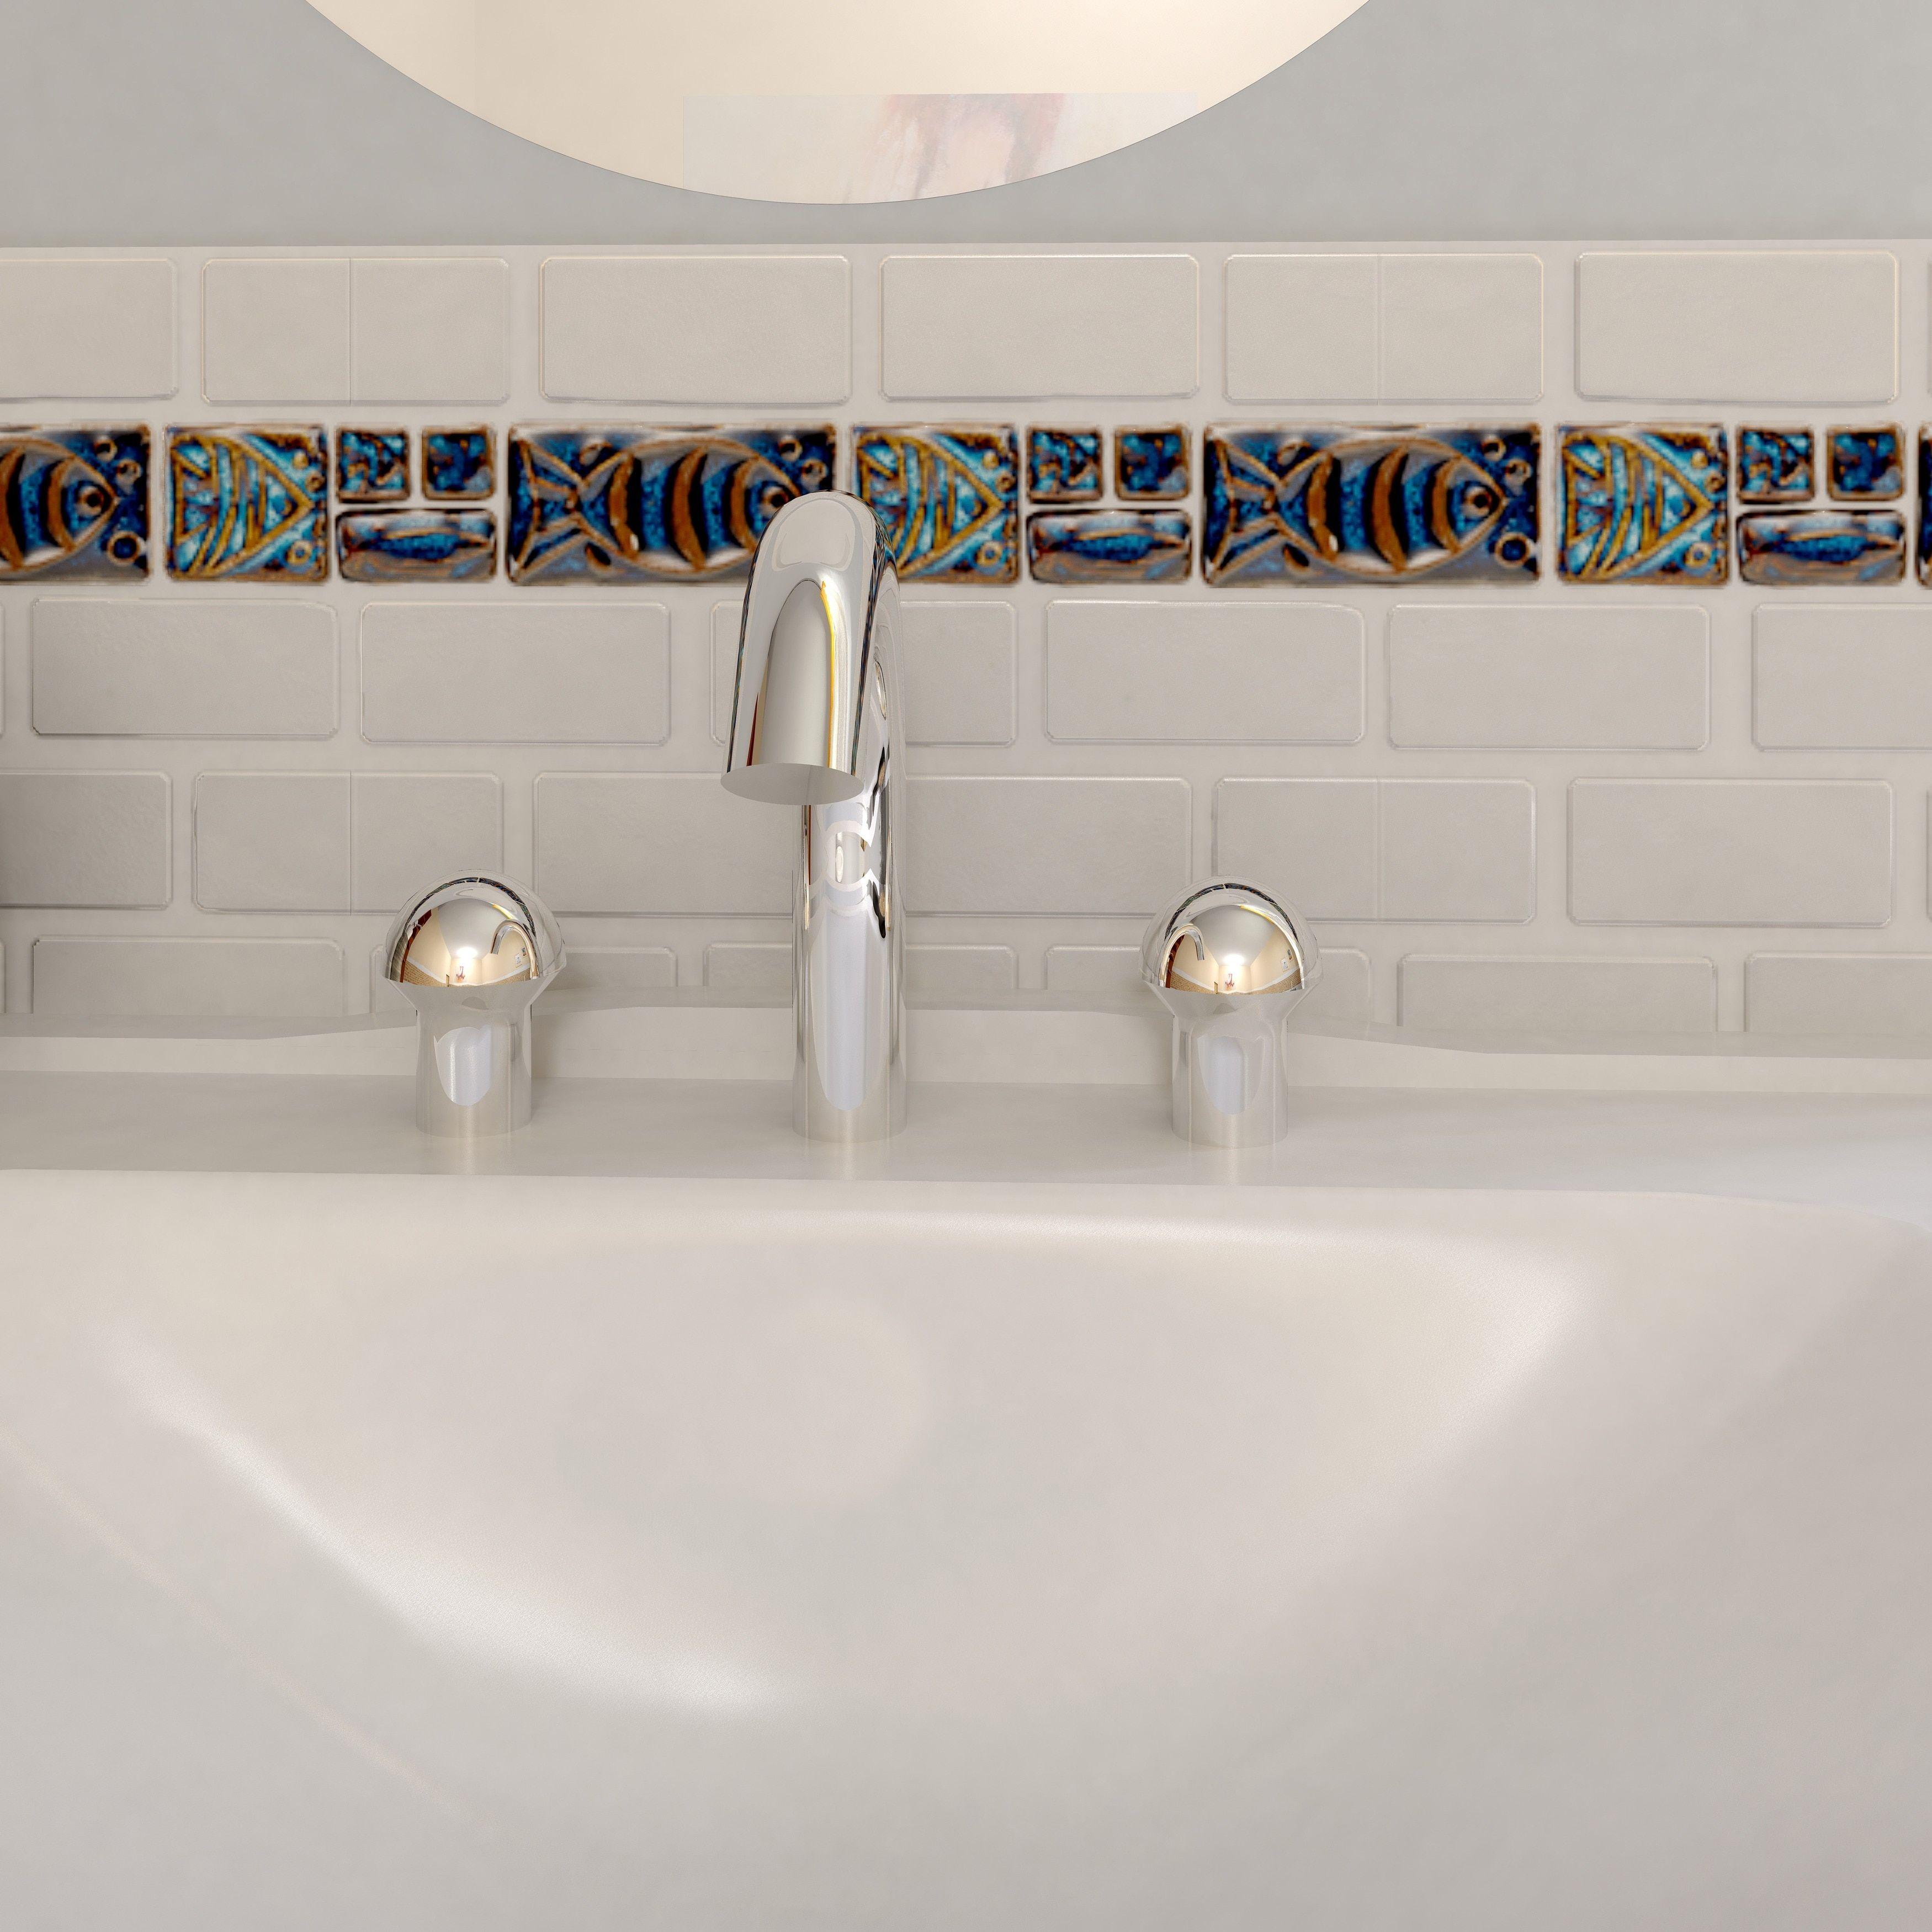 Interlock,Mosaic Tile,Shower Tile,Subway Tile Tile: Free Shipping on ...